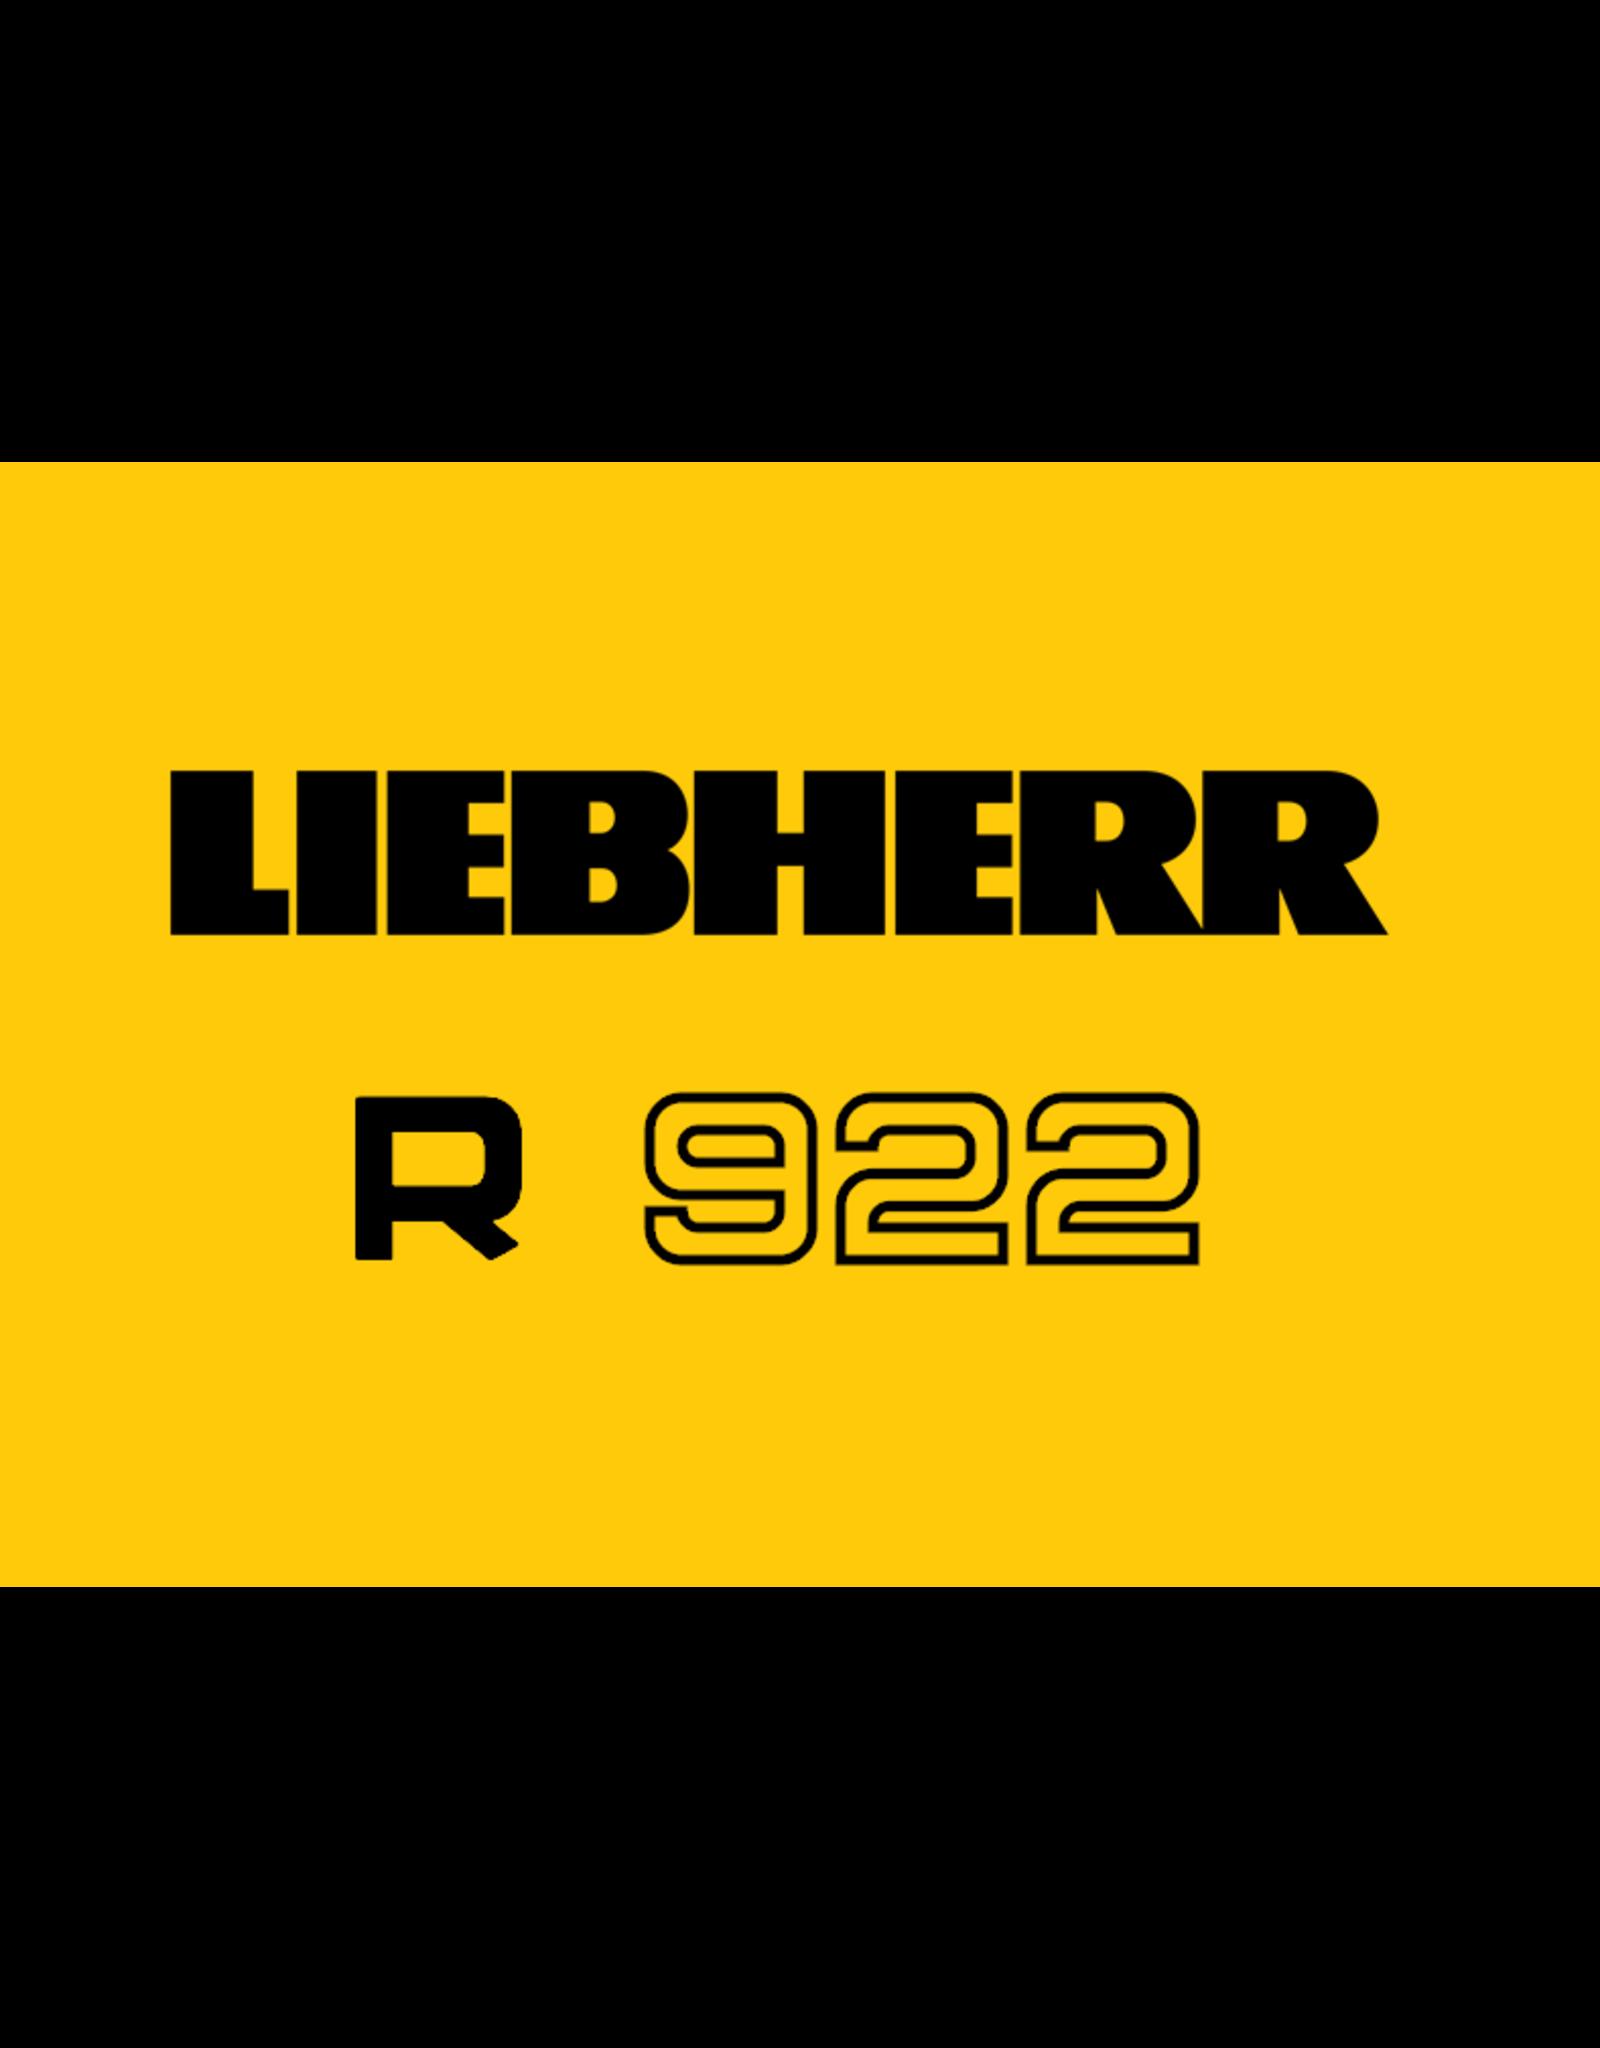 Echle Hartstahl GmbH FOPS for Liebherr R 922